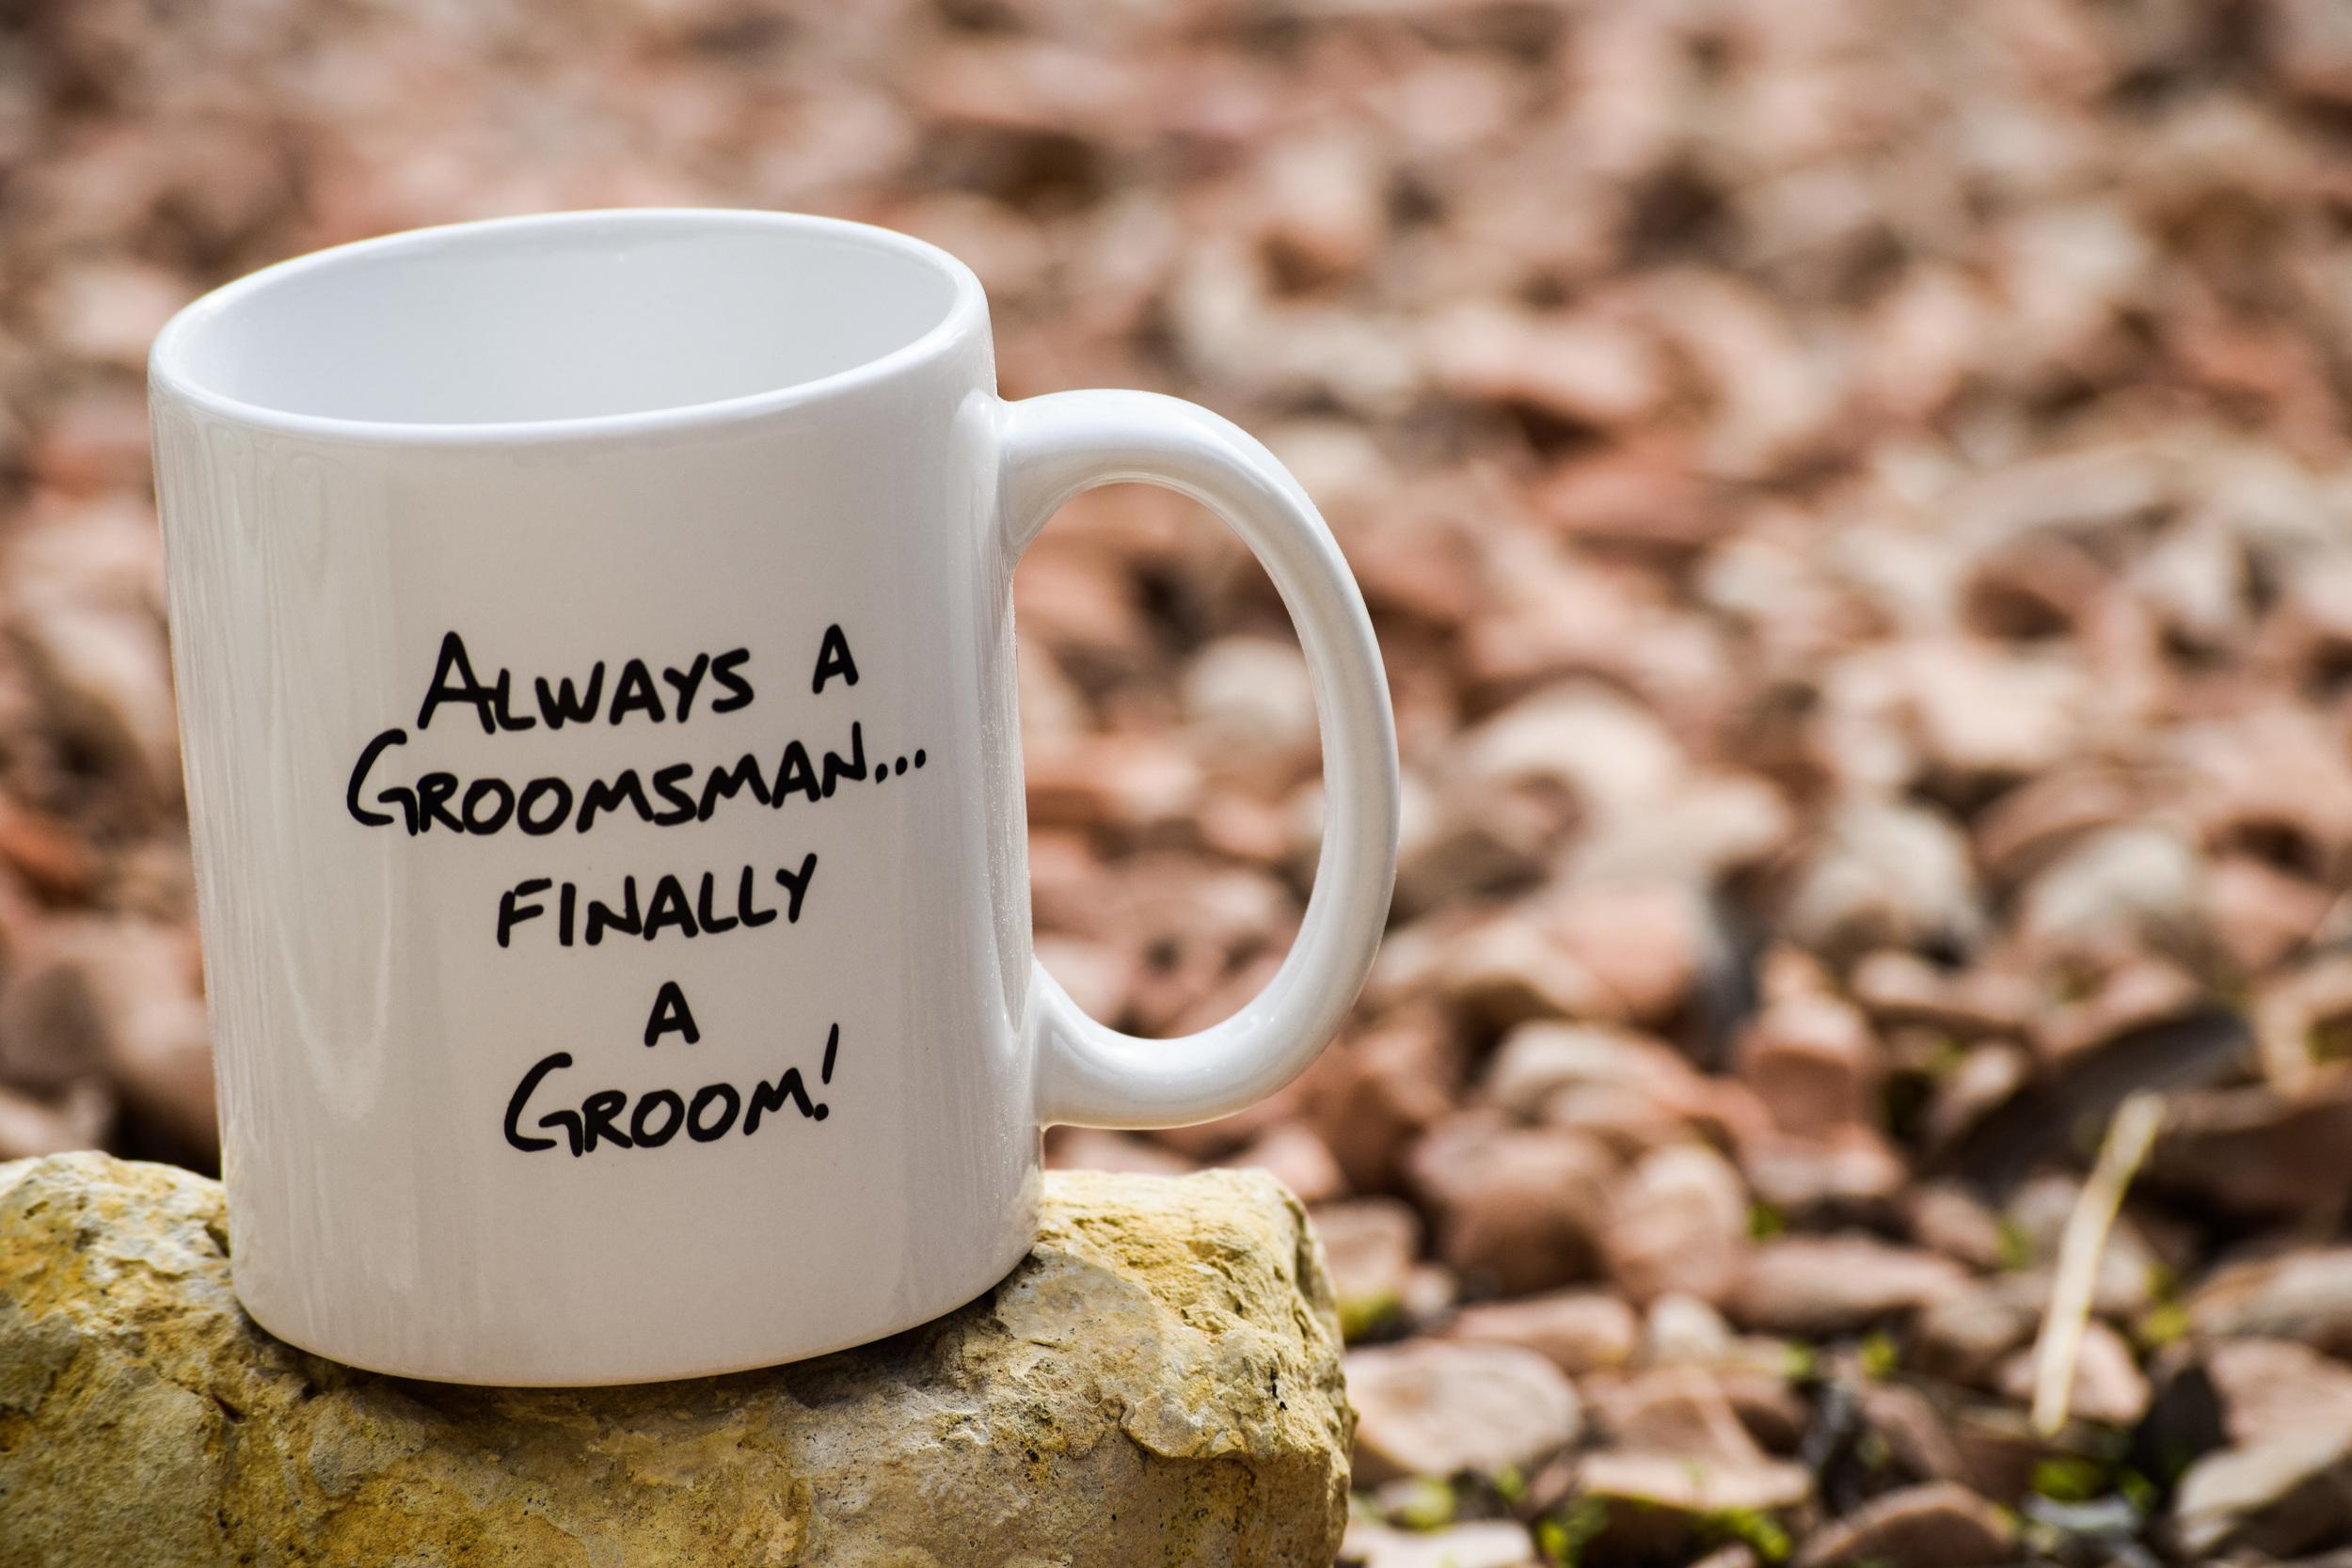 Finally A Groom Coffee Mug by The Chic Factory